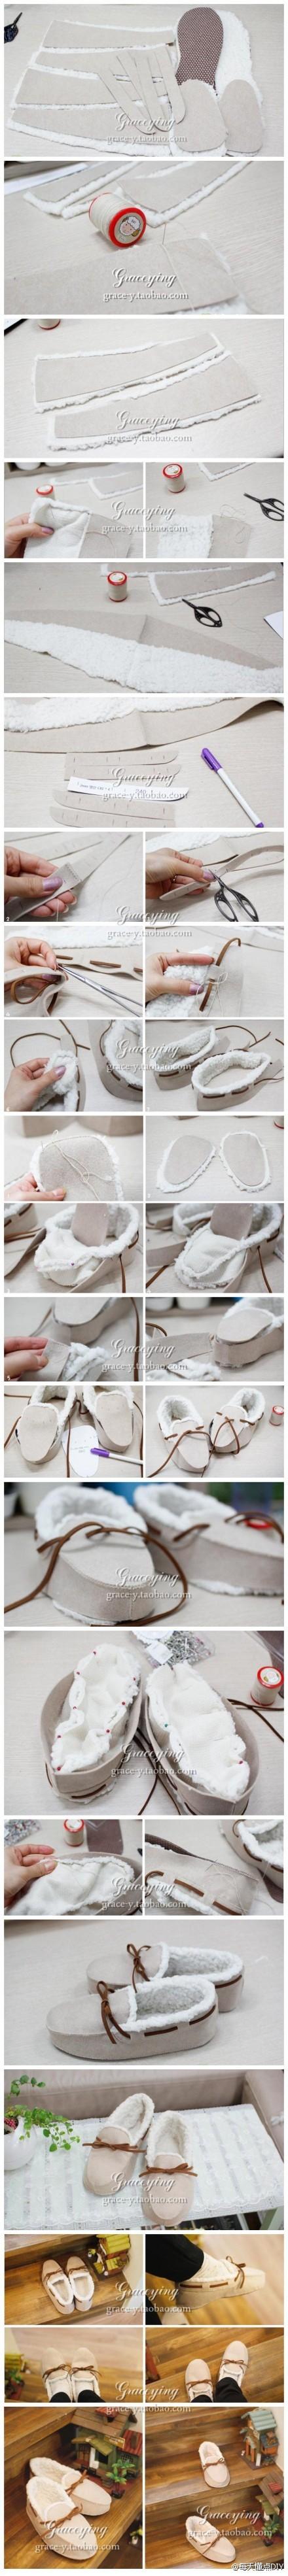 DIY Your Own Fuzzy Moccassins 20111207113312_2BPdz